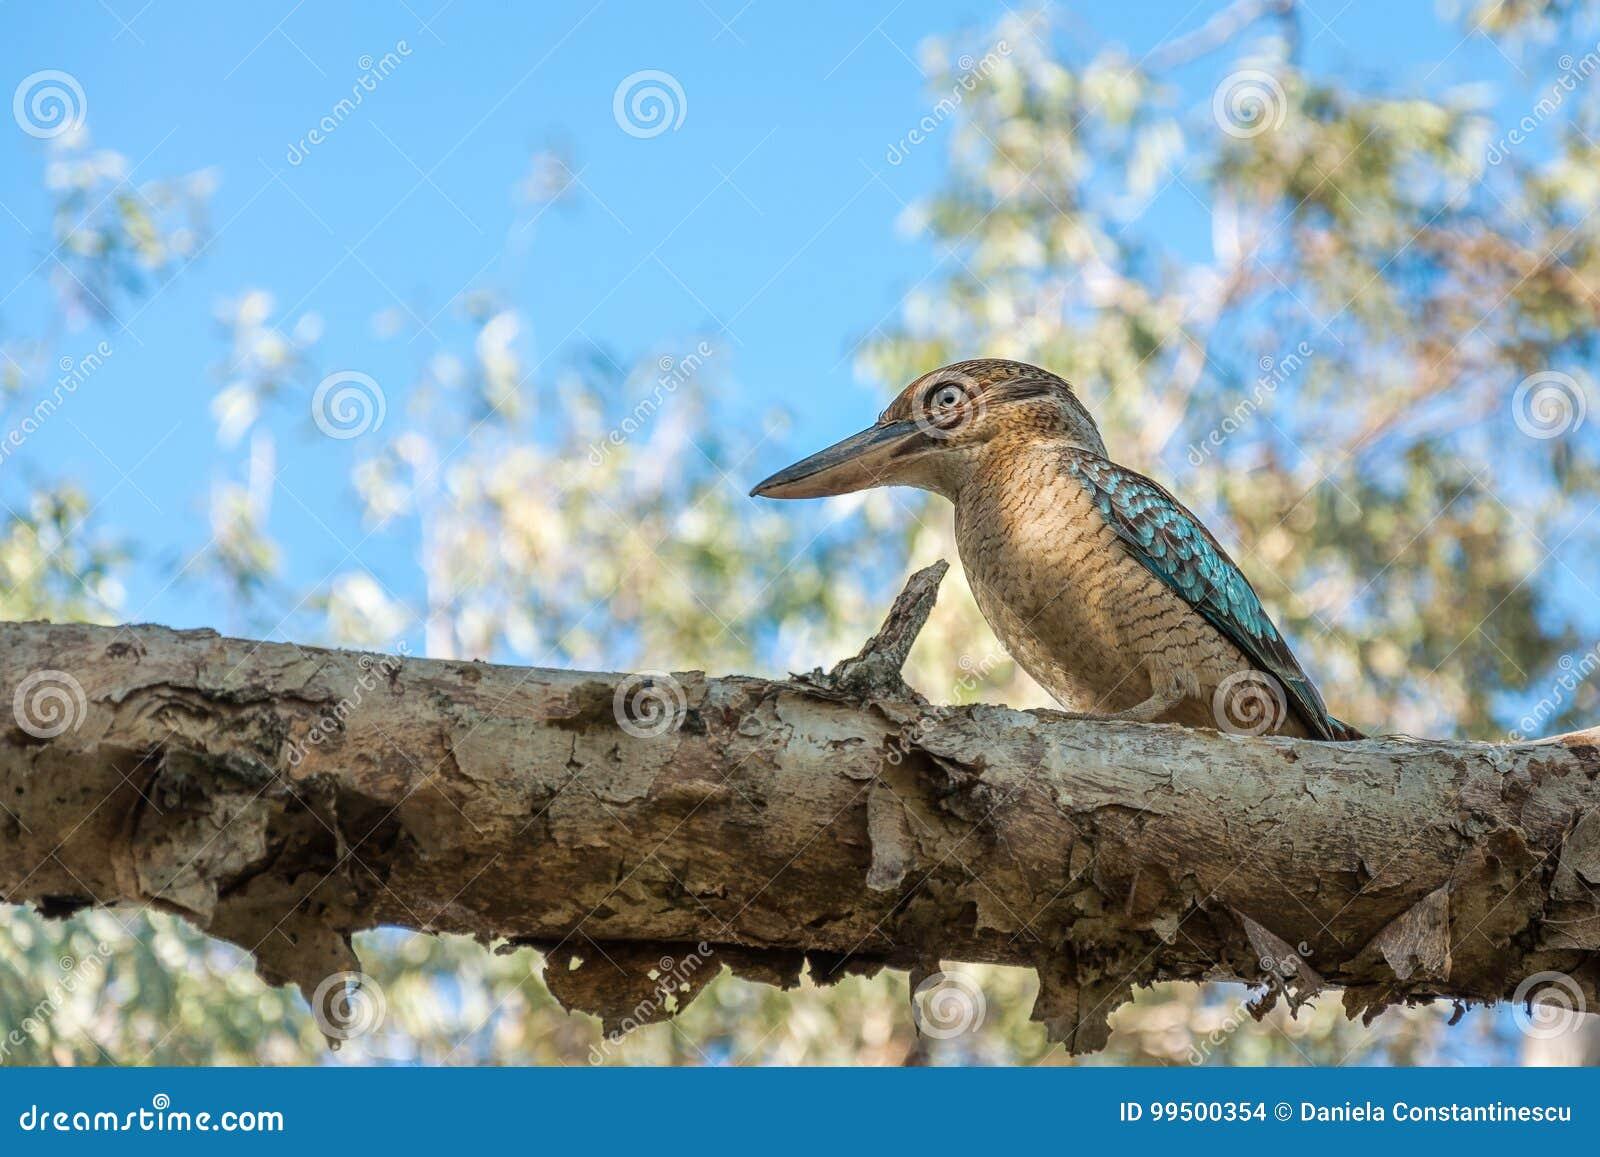 Kingfisher blue-winged Kookaburra on a tree branch at Katherine gorge, Australia